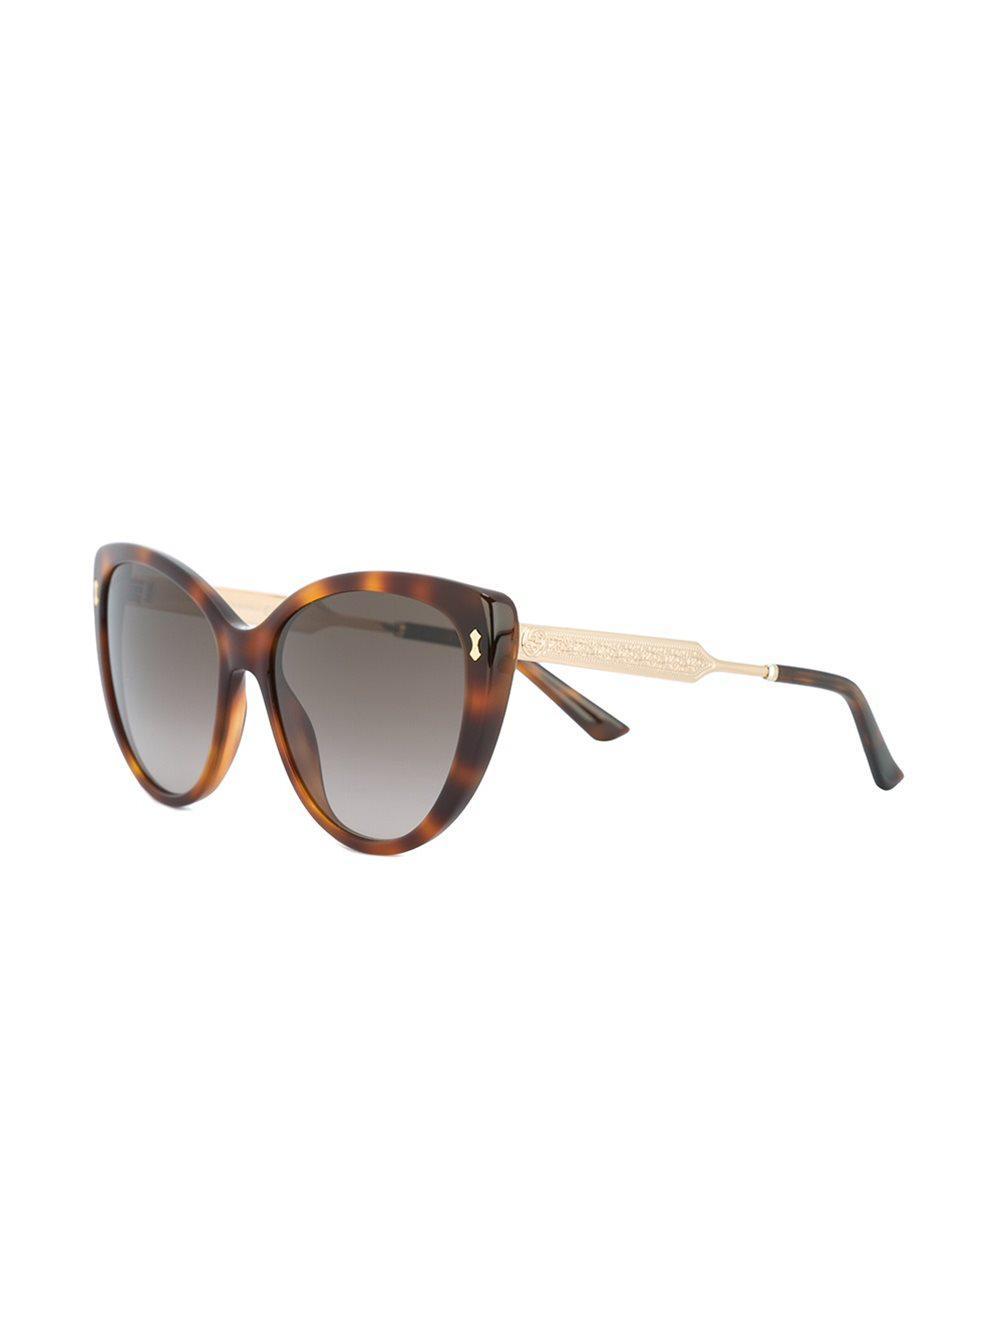 42d43219a84 Gucci - Brown Butterfly Frame Sunglasses - Lyst. View fullscreen